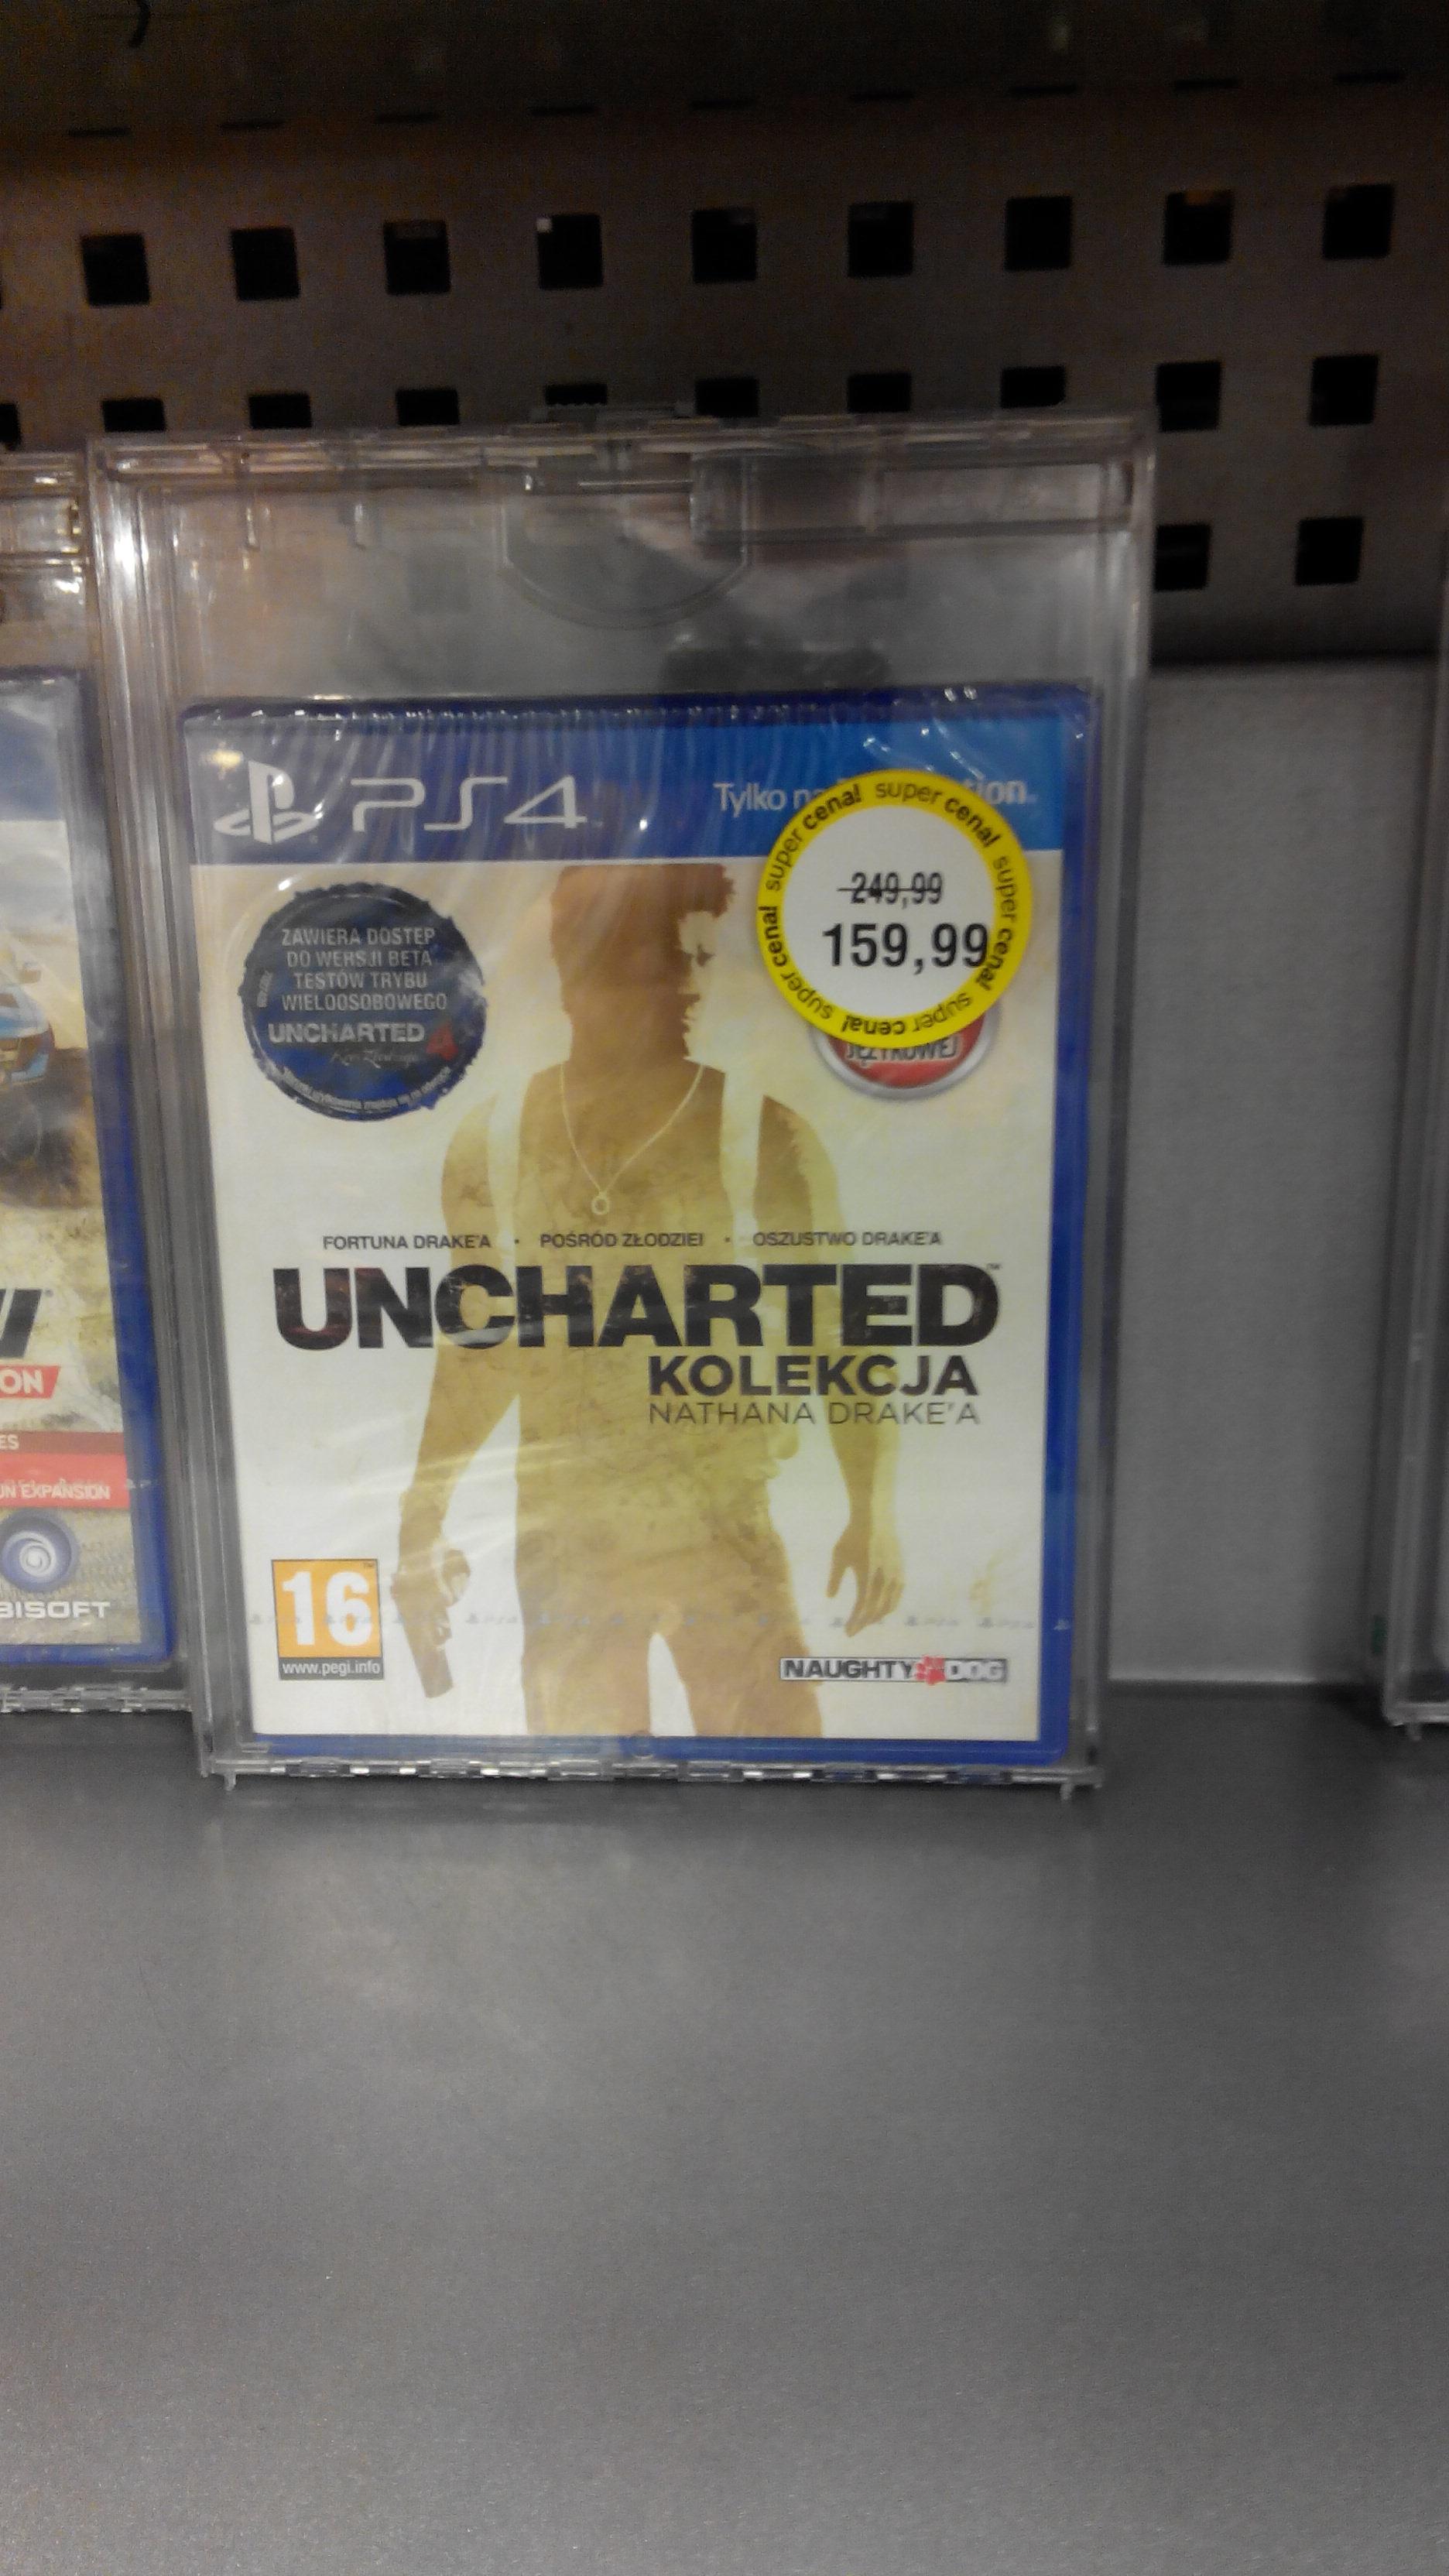 Uncharted Kolekcja Drake'a za 159,99 zl @ Empik